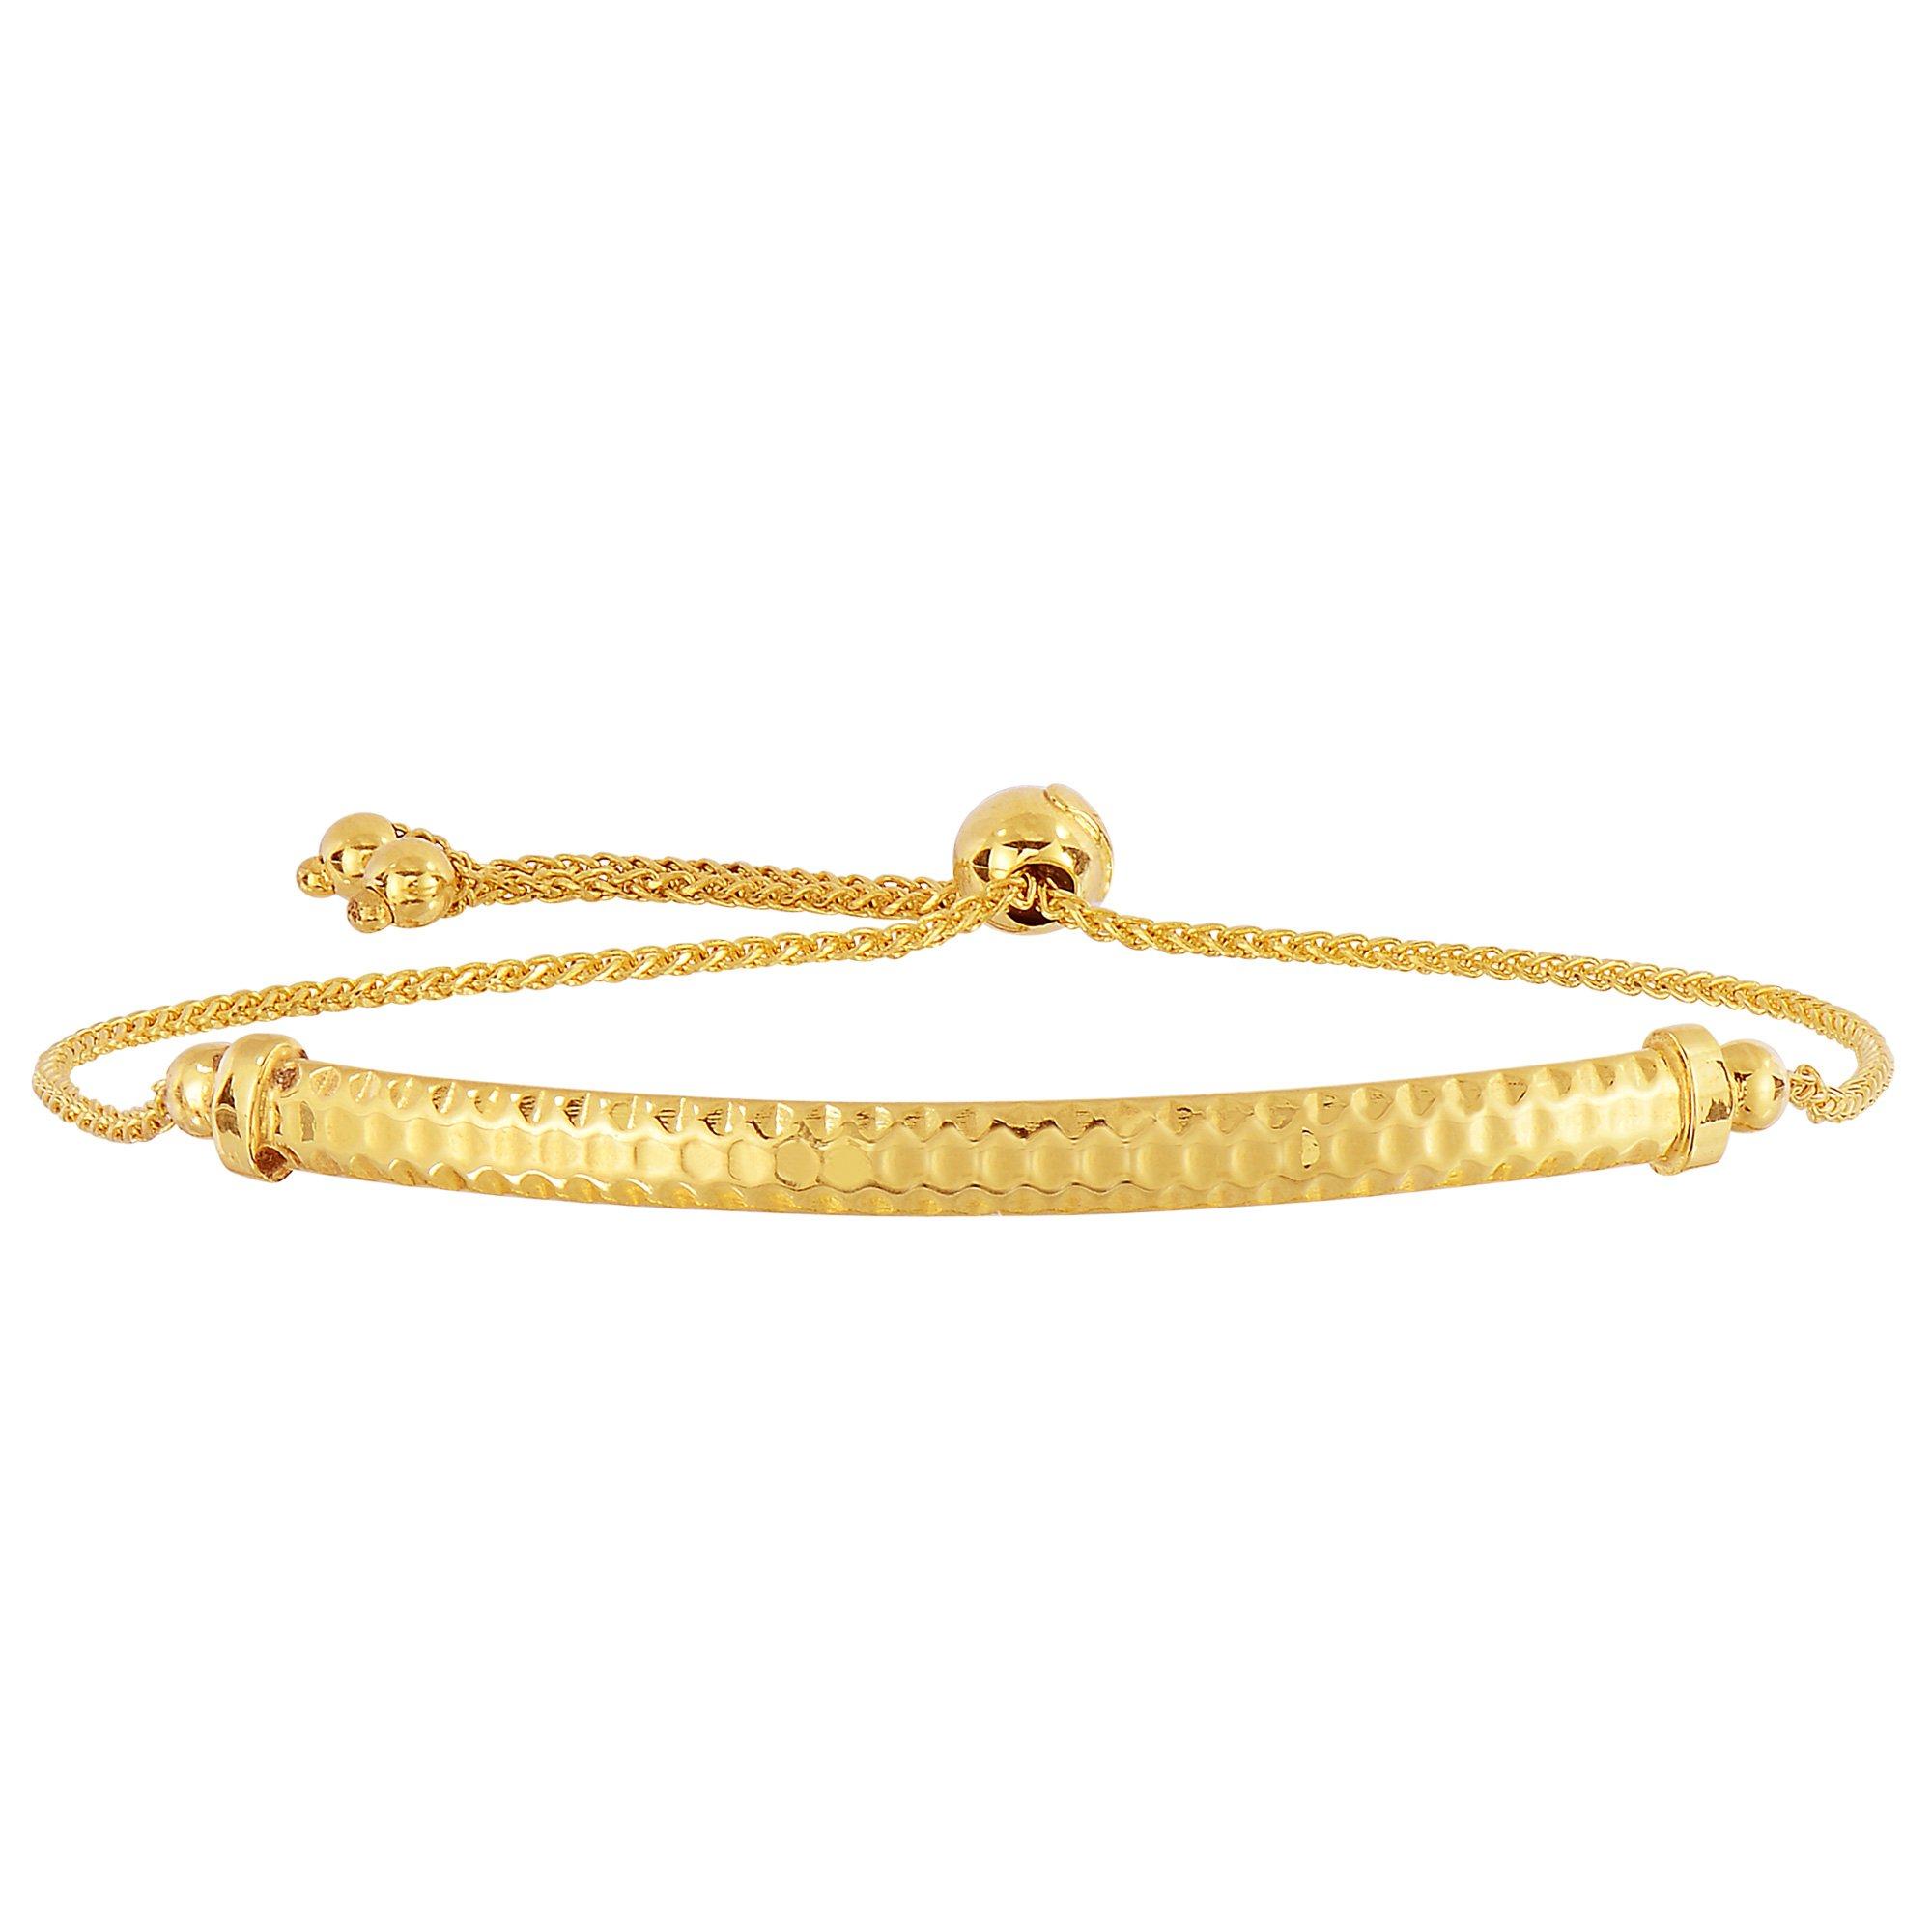 14K Yellow Gold Diamond Cut Round Wheat Adjustable Bracelet With Diamond Cut Arched Bar, 9.25''